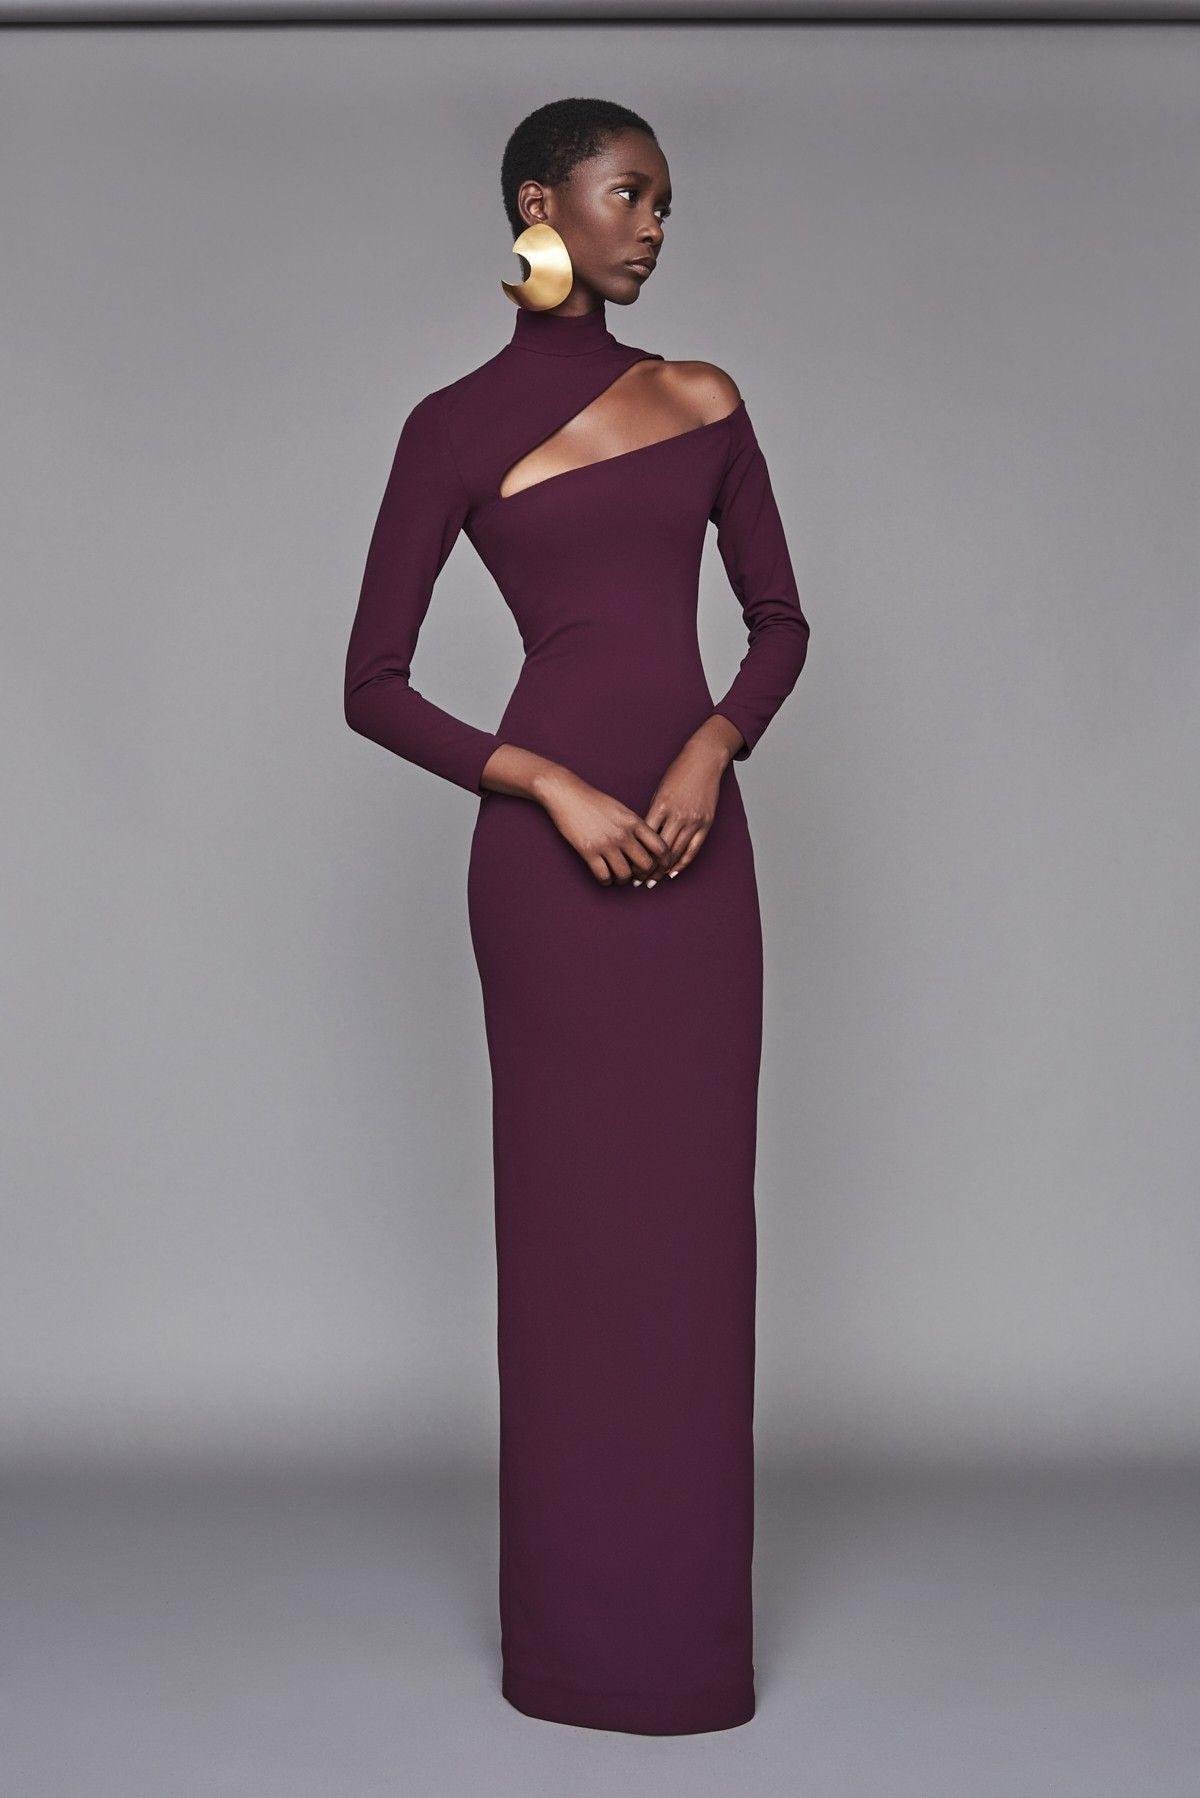 00bd9e9fff5 Solace London Ares Dress Aubergine